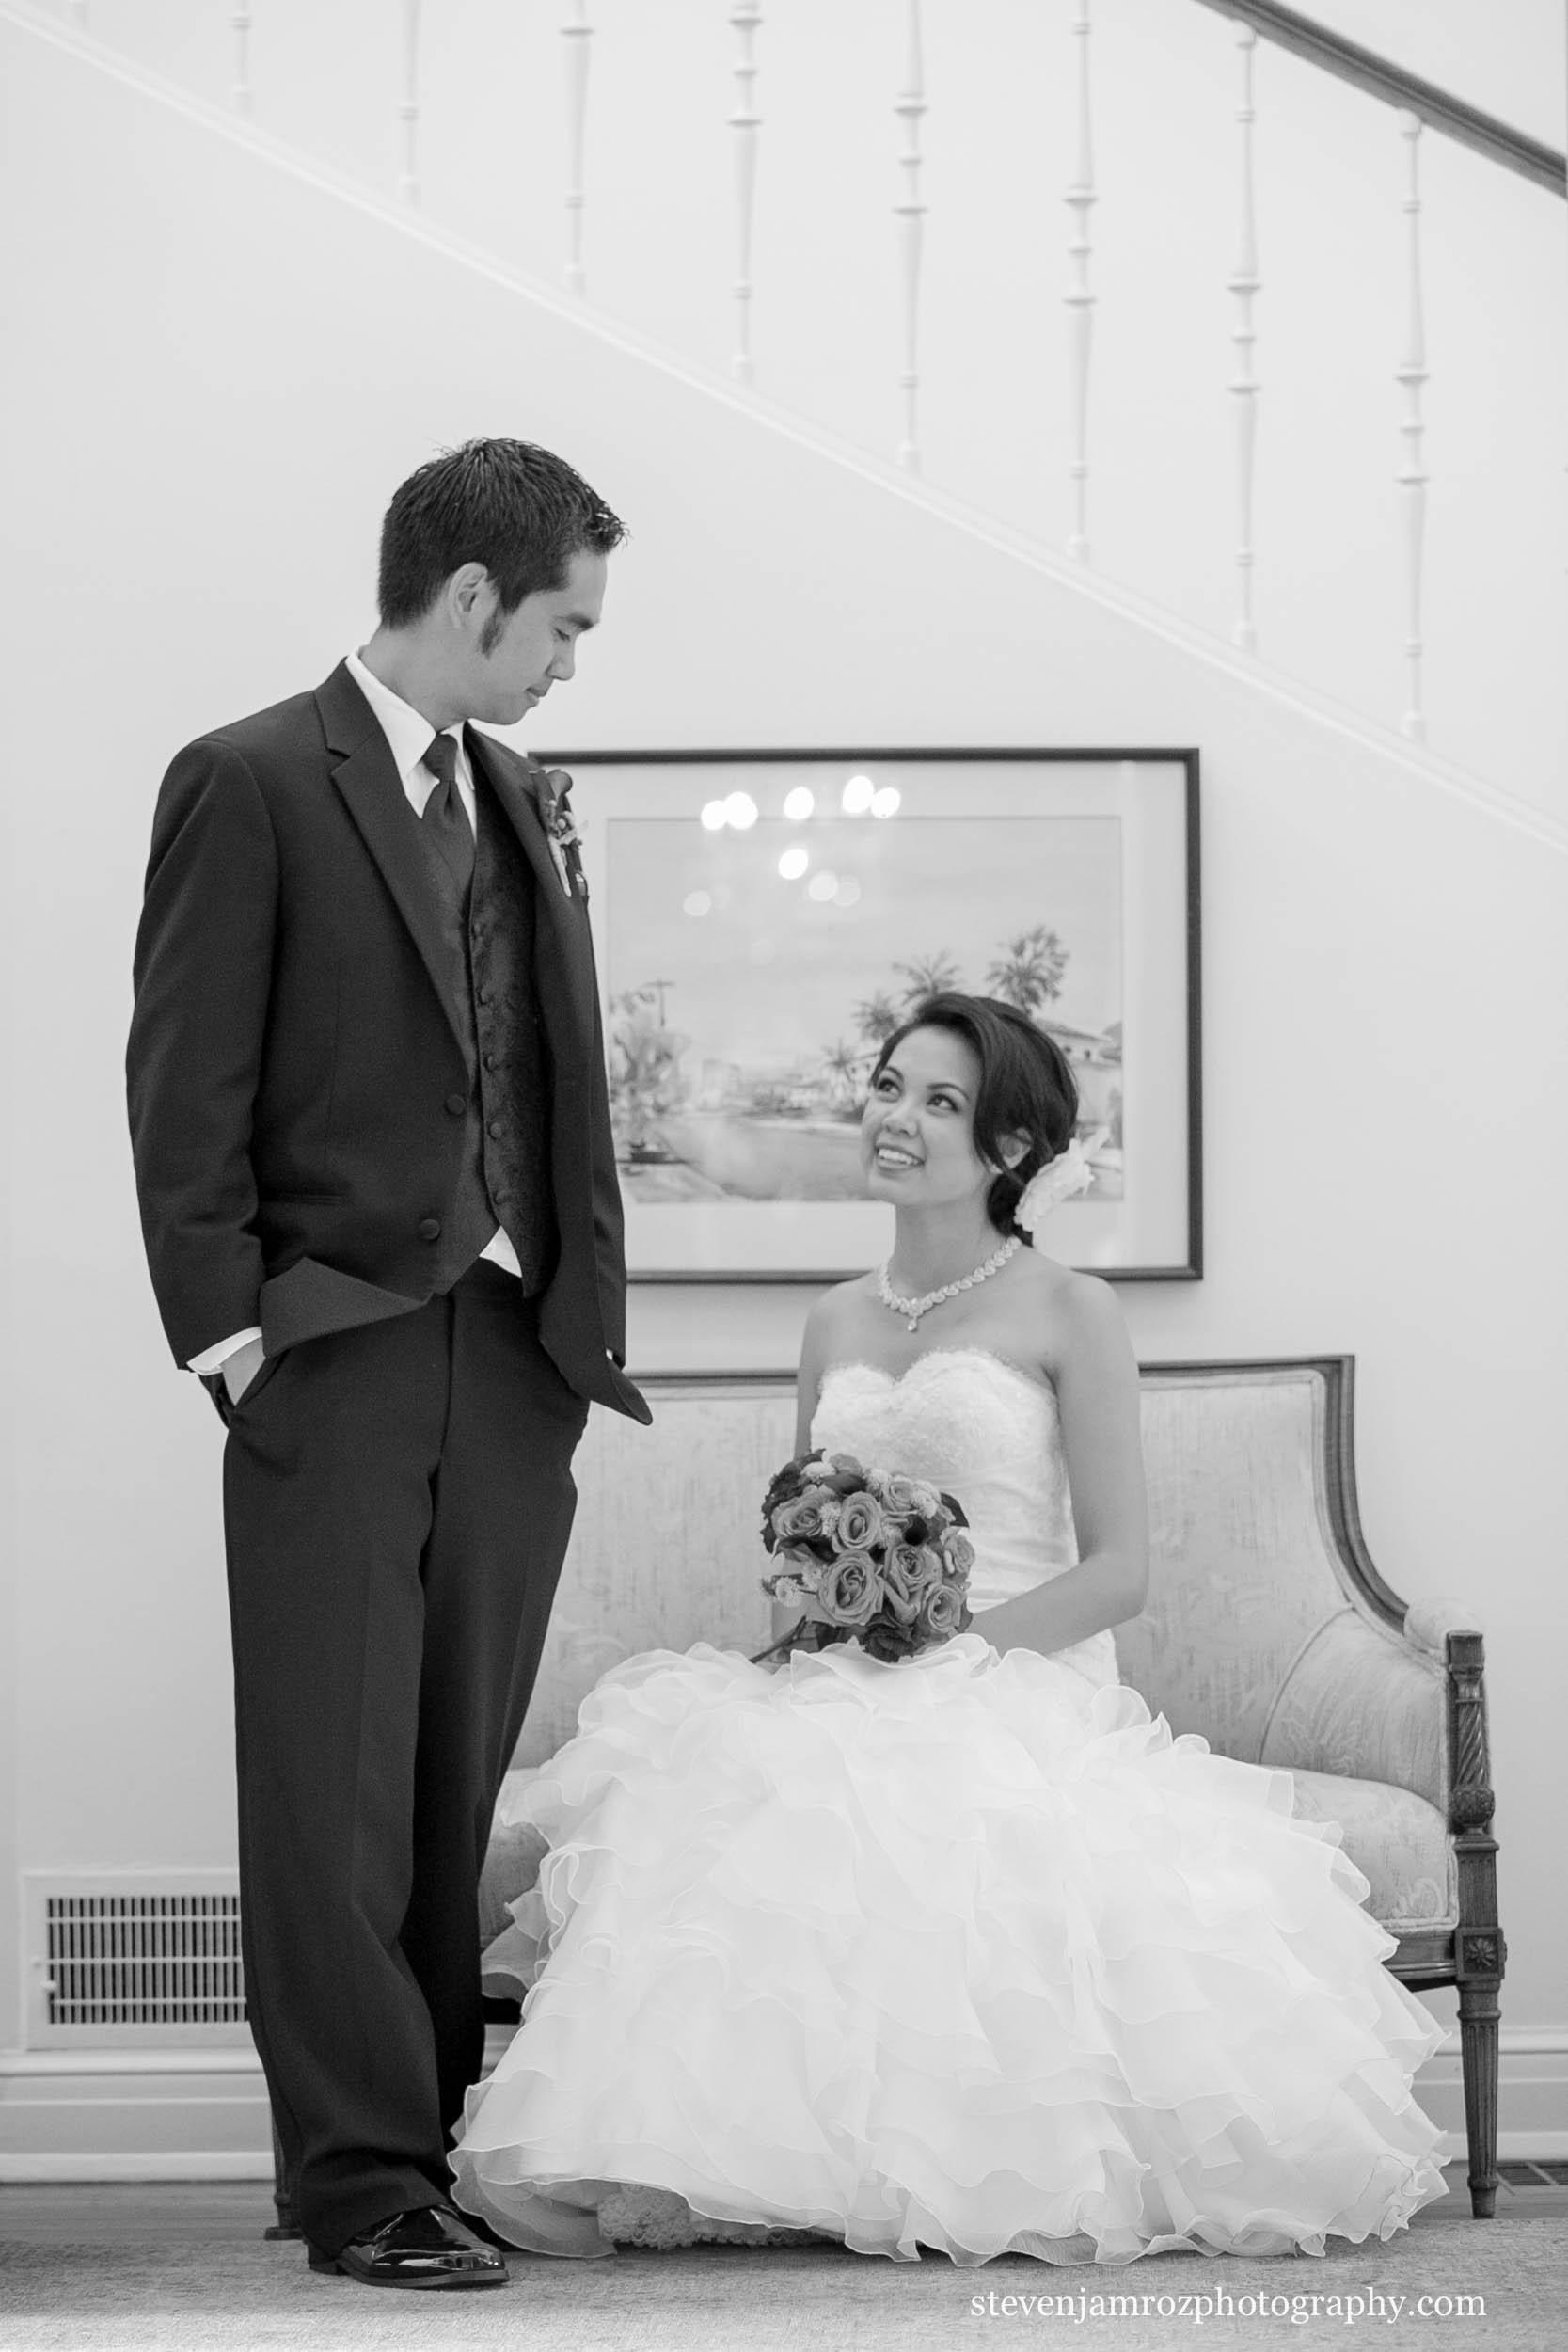 pretty-dress-groom-wedding-in-raleigh-steven-jamroz-photography-0234.jpg